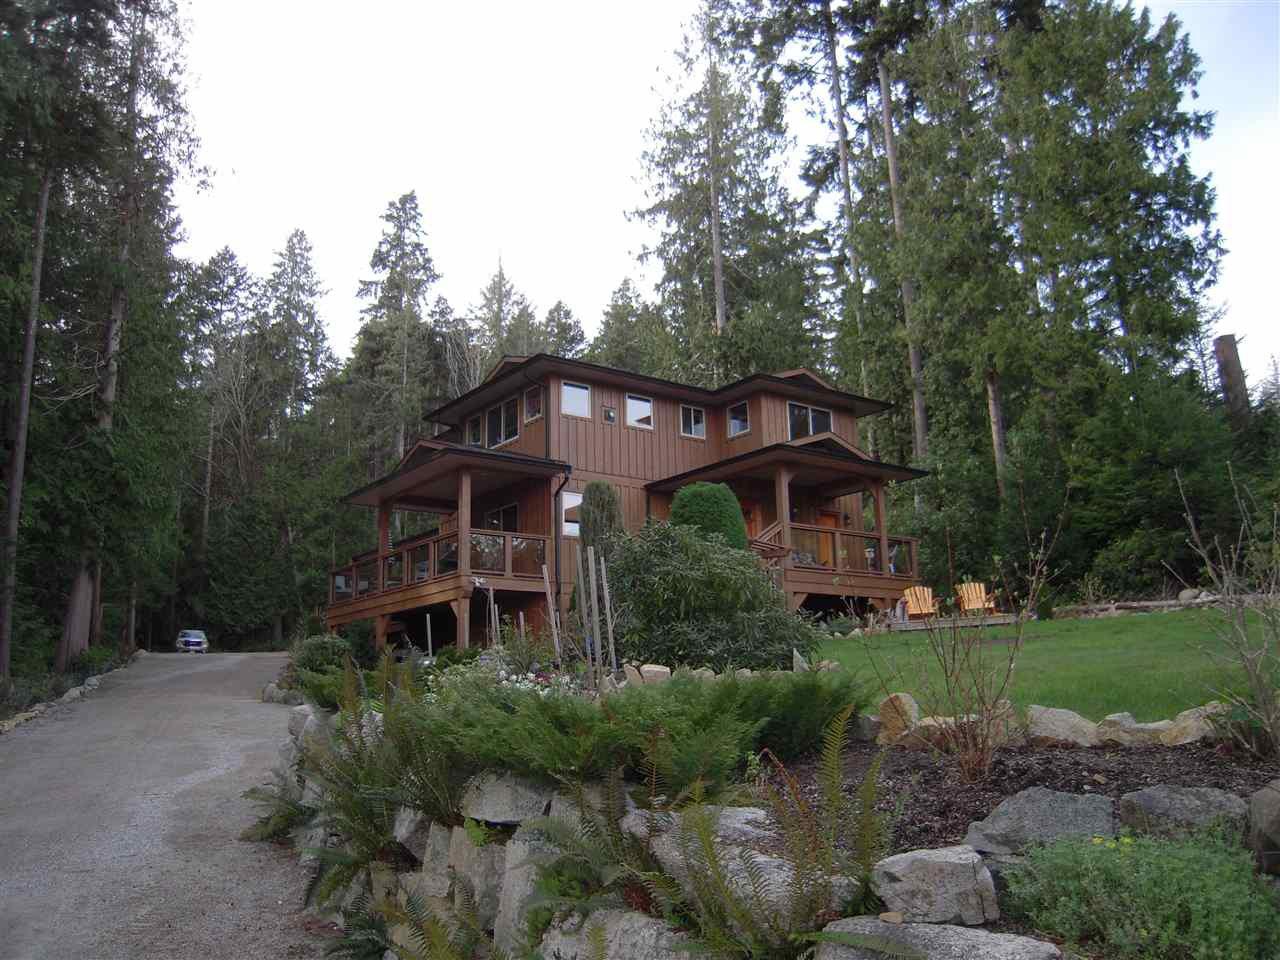 Main Photo: 5447 WAKEFIELD ROAD in Sechelt: Sechelt District House for sale (Sunshine Coast)  : MLS®# R2047962